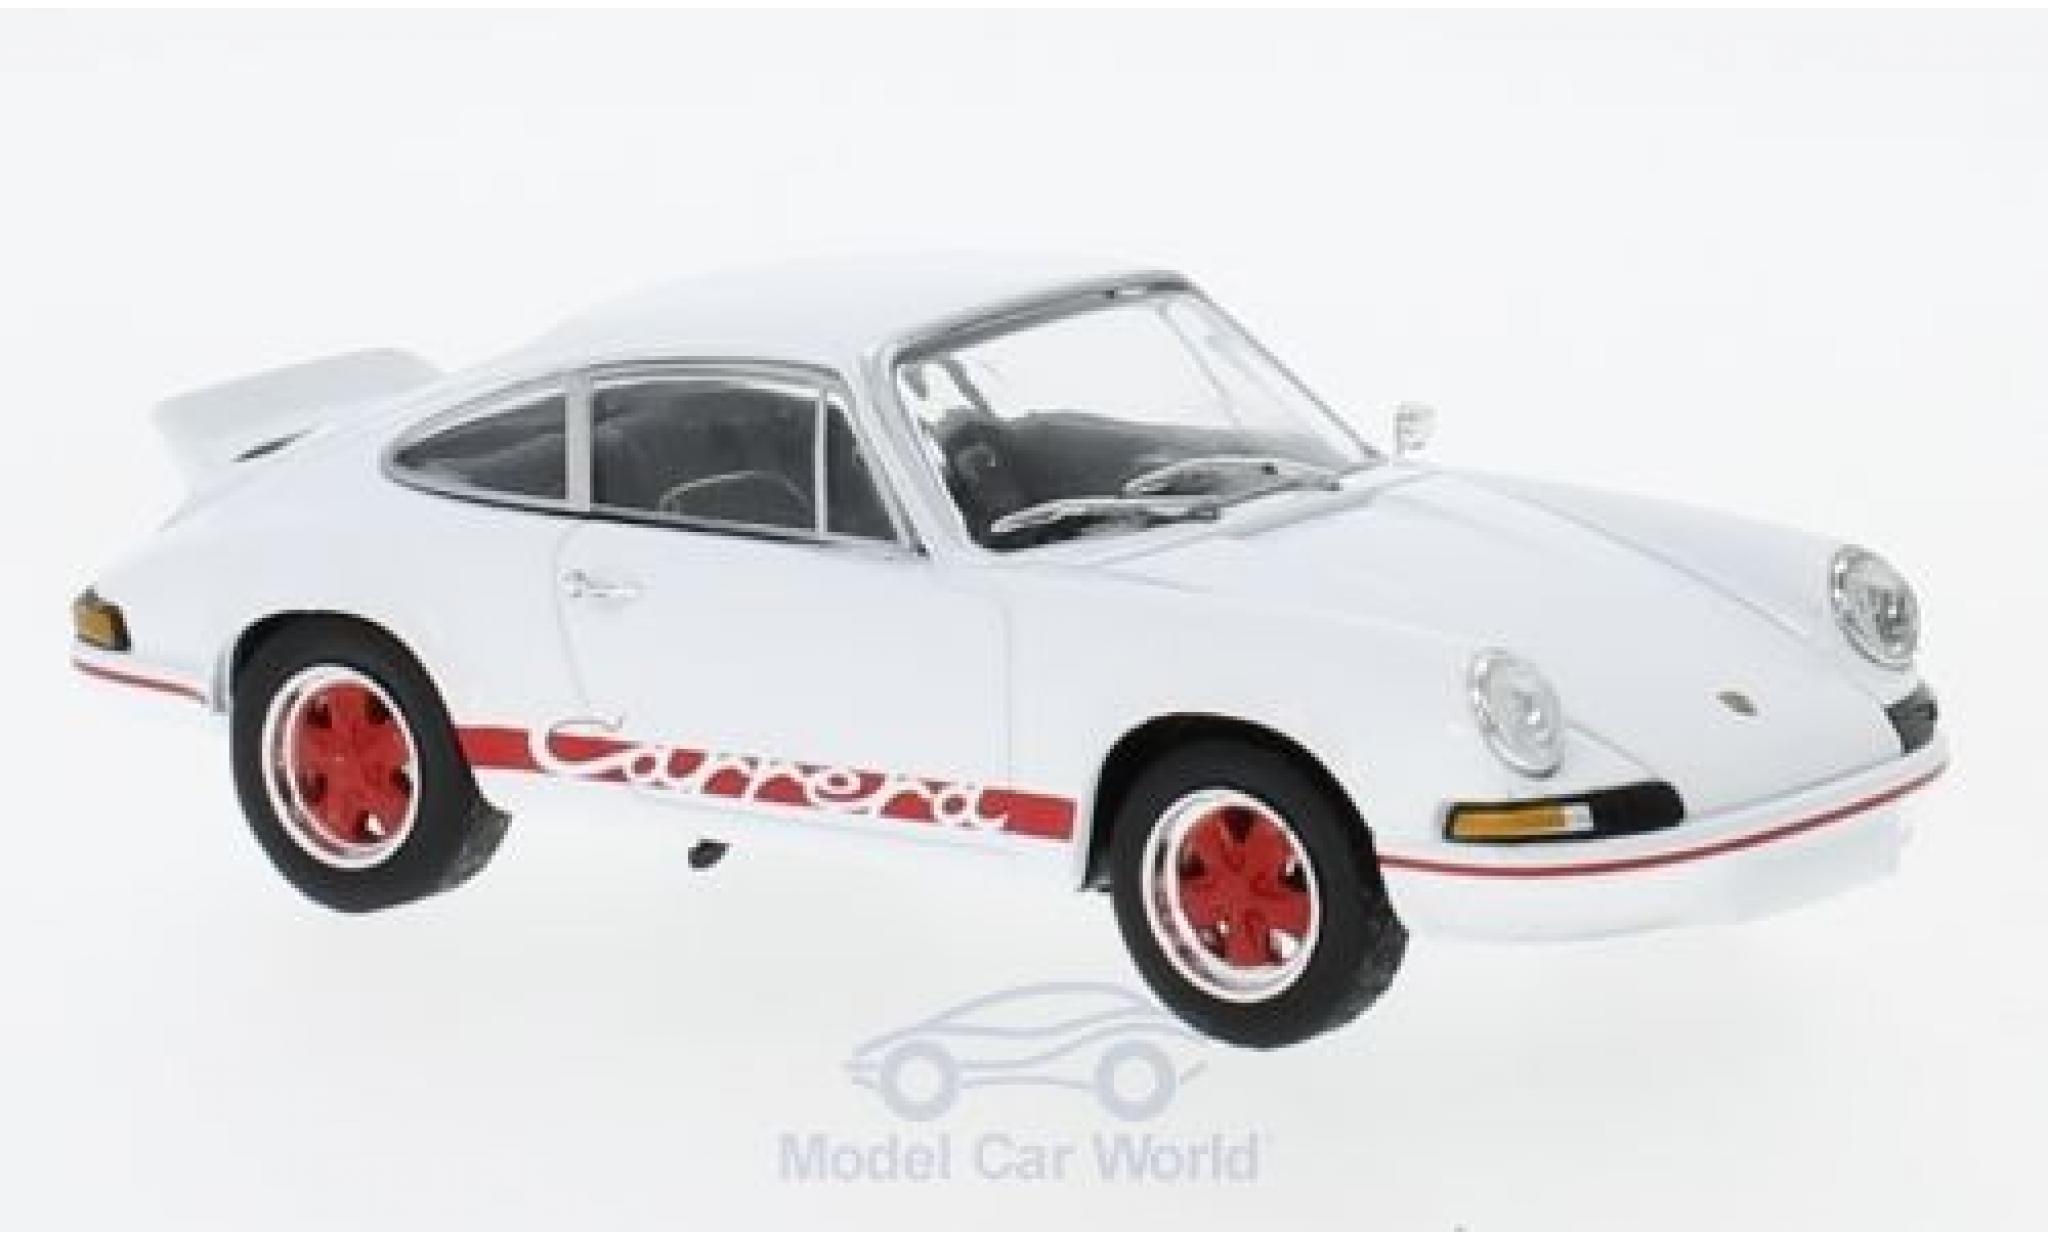 Porsche 911 SC 1/43 SpecialC 111 Carrera  white 1973 Collection